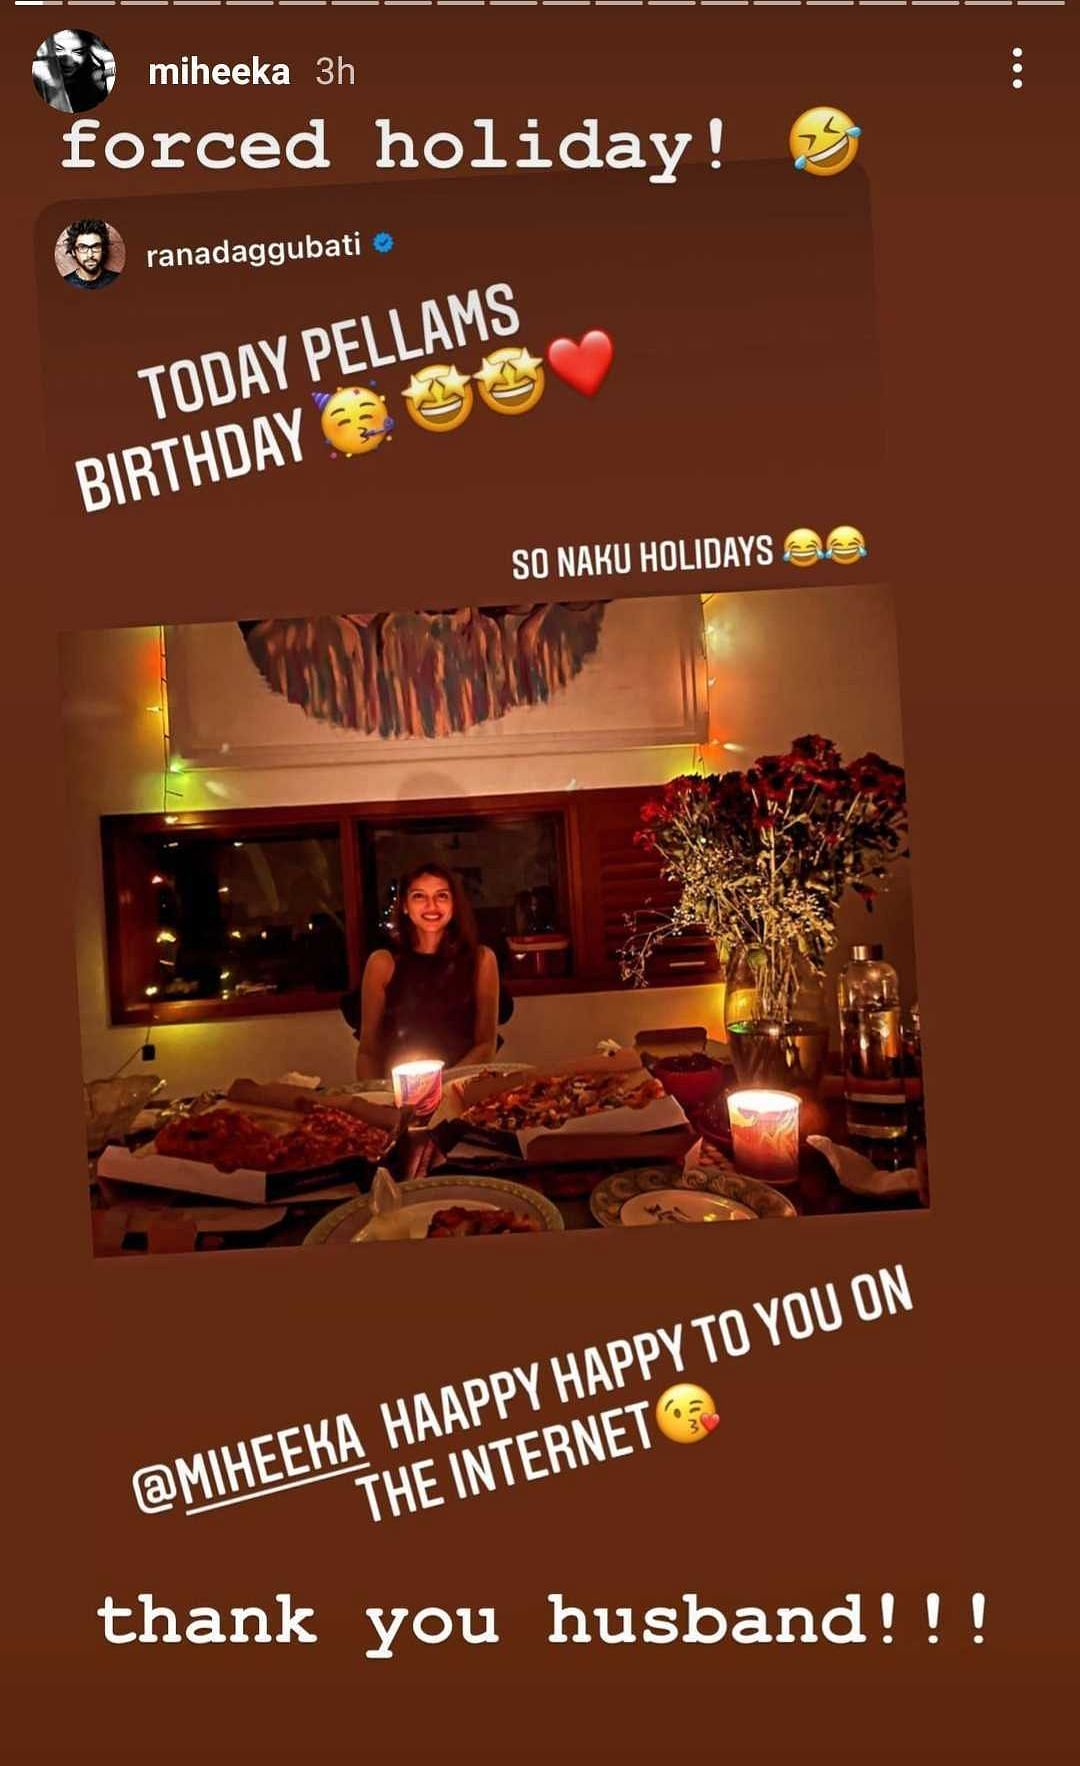 Rana Daggubati hosts candlelight pizza party for his 'Pellam' Miheeka on her birthday